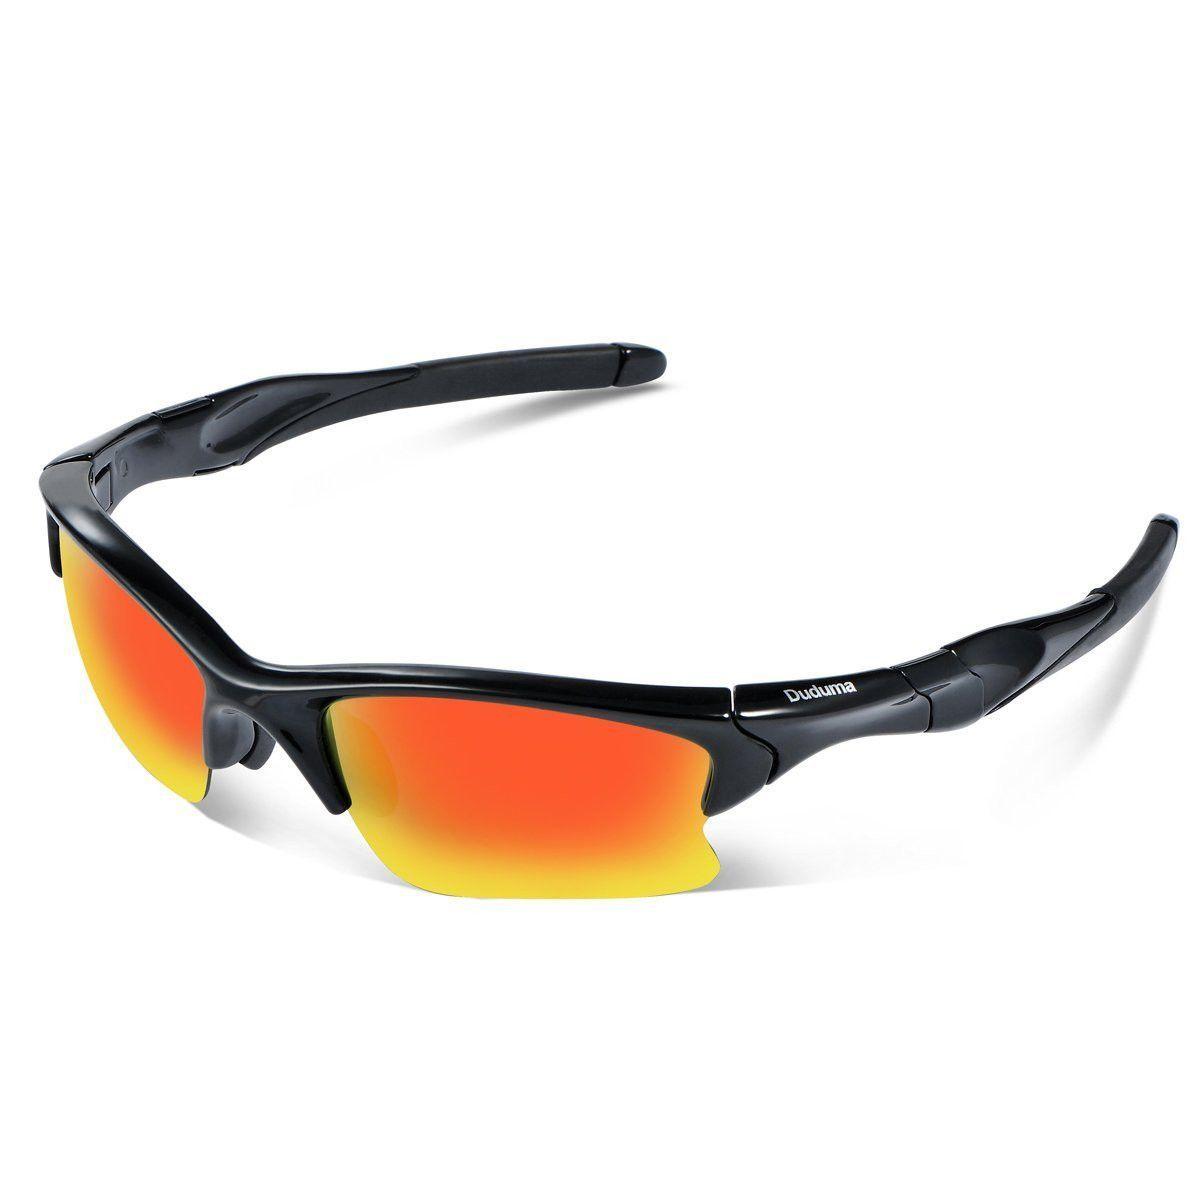 29e4bf6aa3 Duduma Polarized Sports Sunglasses for Men Women Baseball Fishing Golf  Running Cycling Driving Softball Hiking Floating Unbreakable Shades Tr566